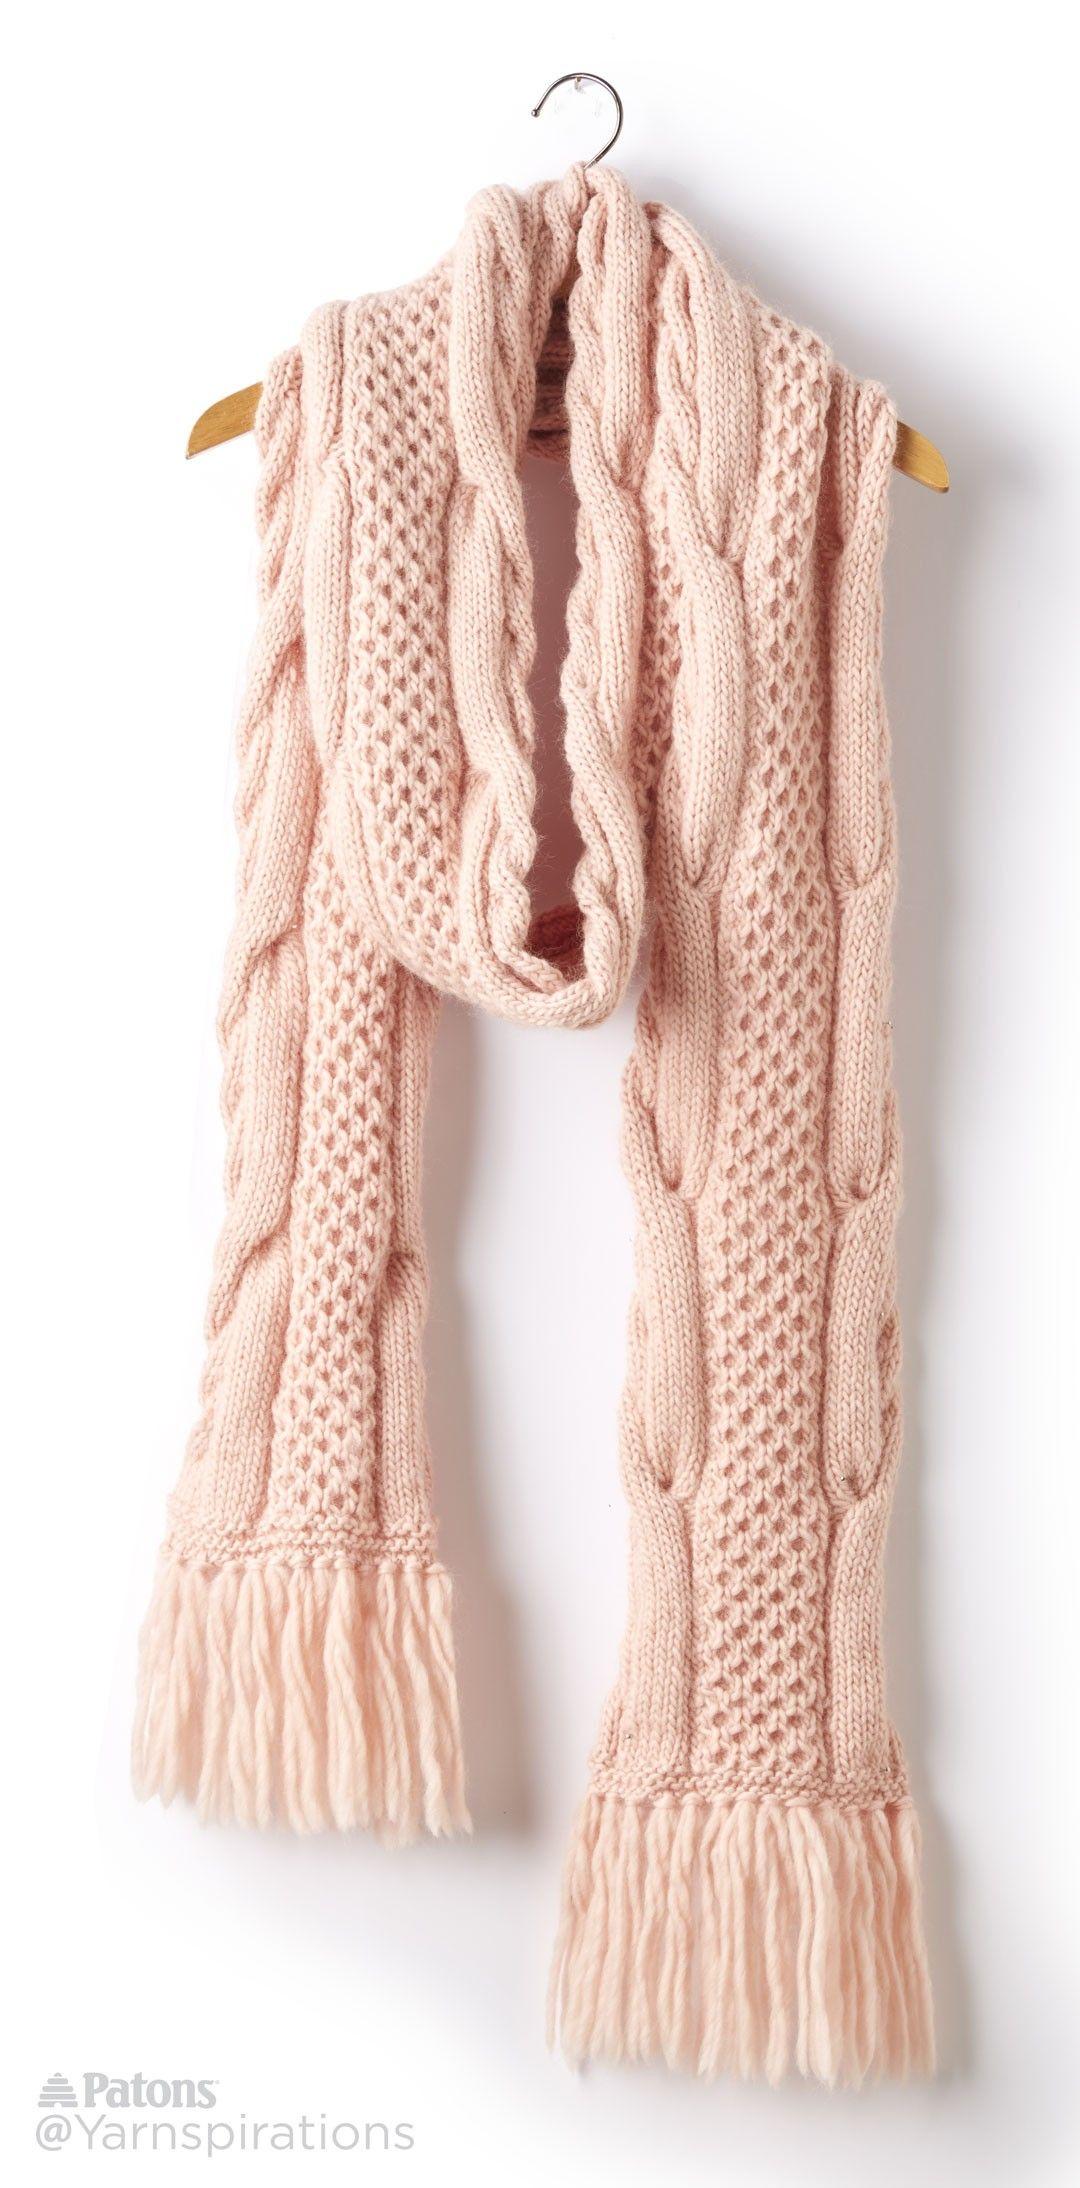 Honey Comb Twist Knit Super Scarf - Patterns | Yarnspirations ...